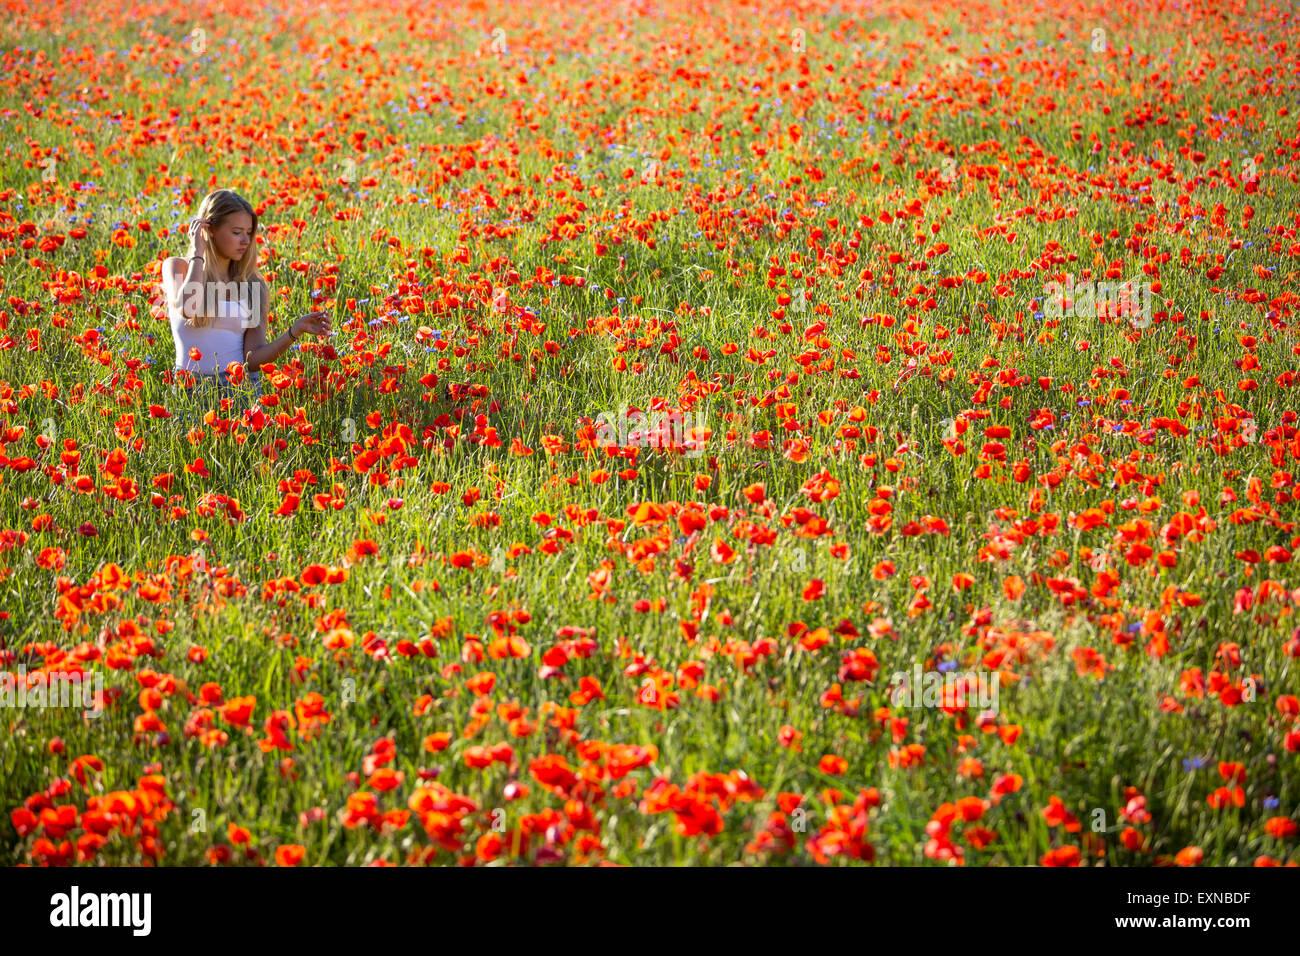 Germany, Bavaria, girl in a poppy field - Stock Image